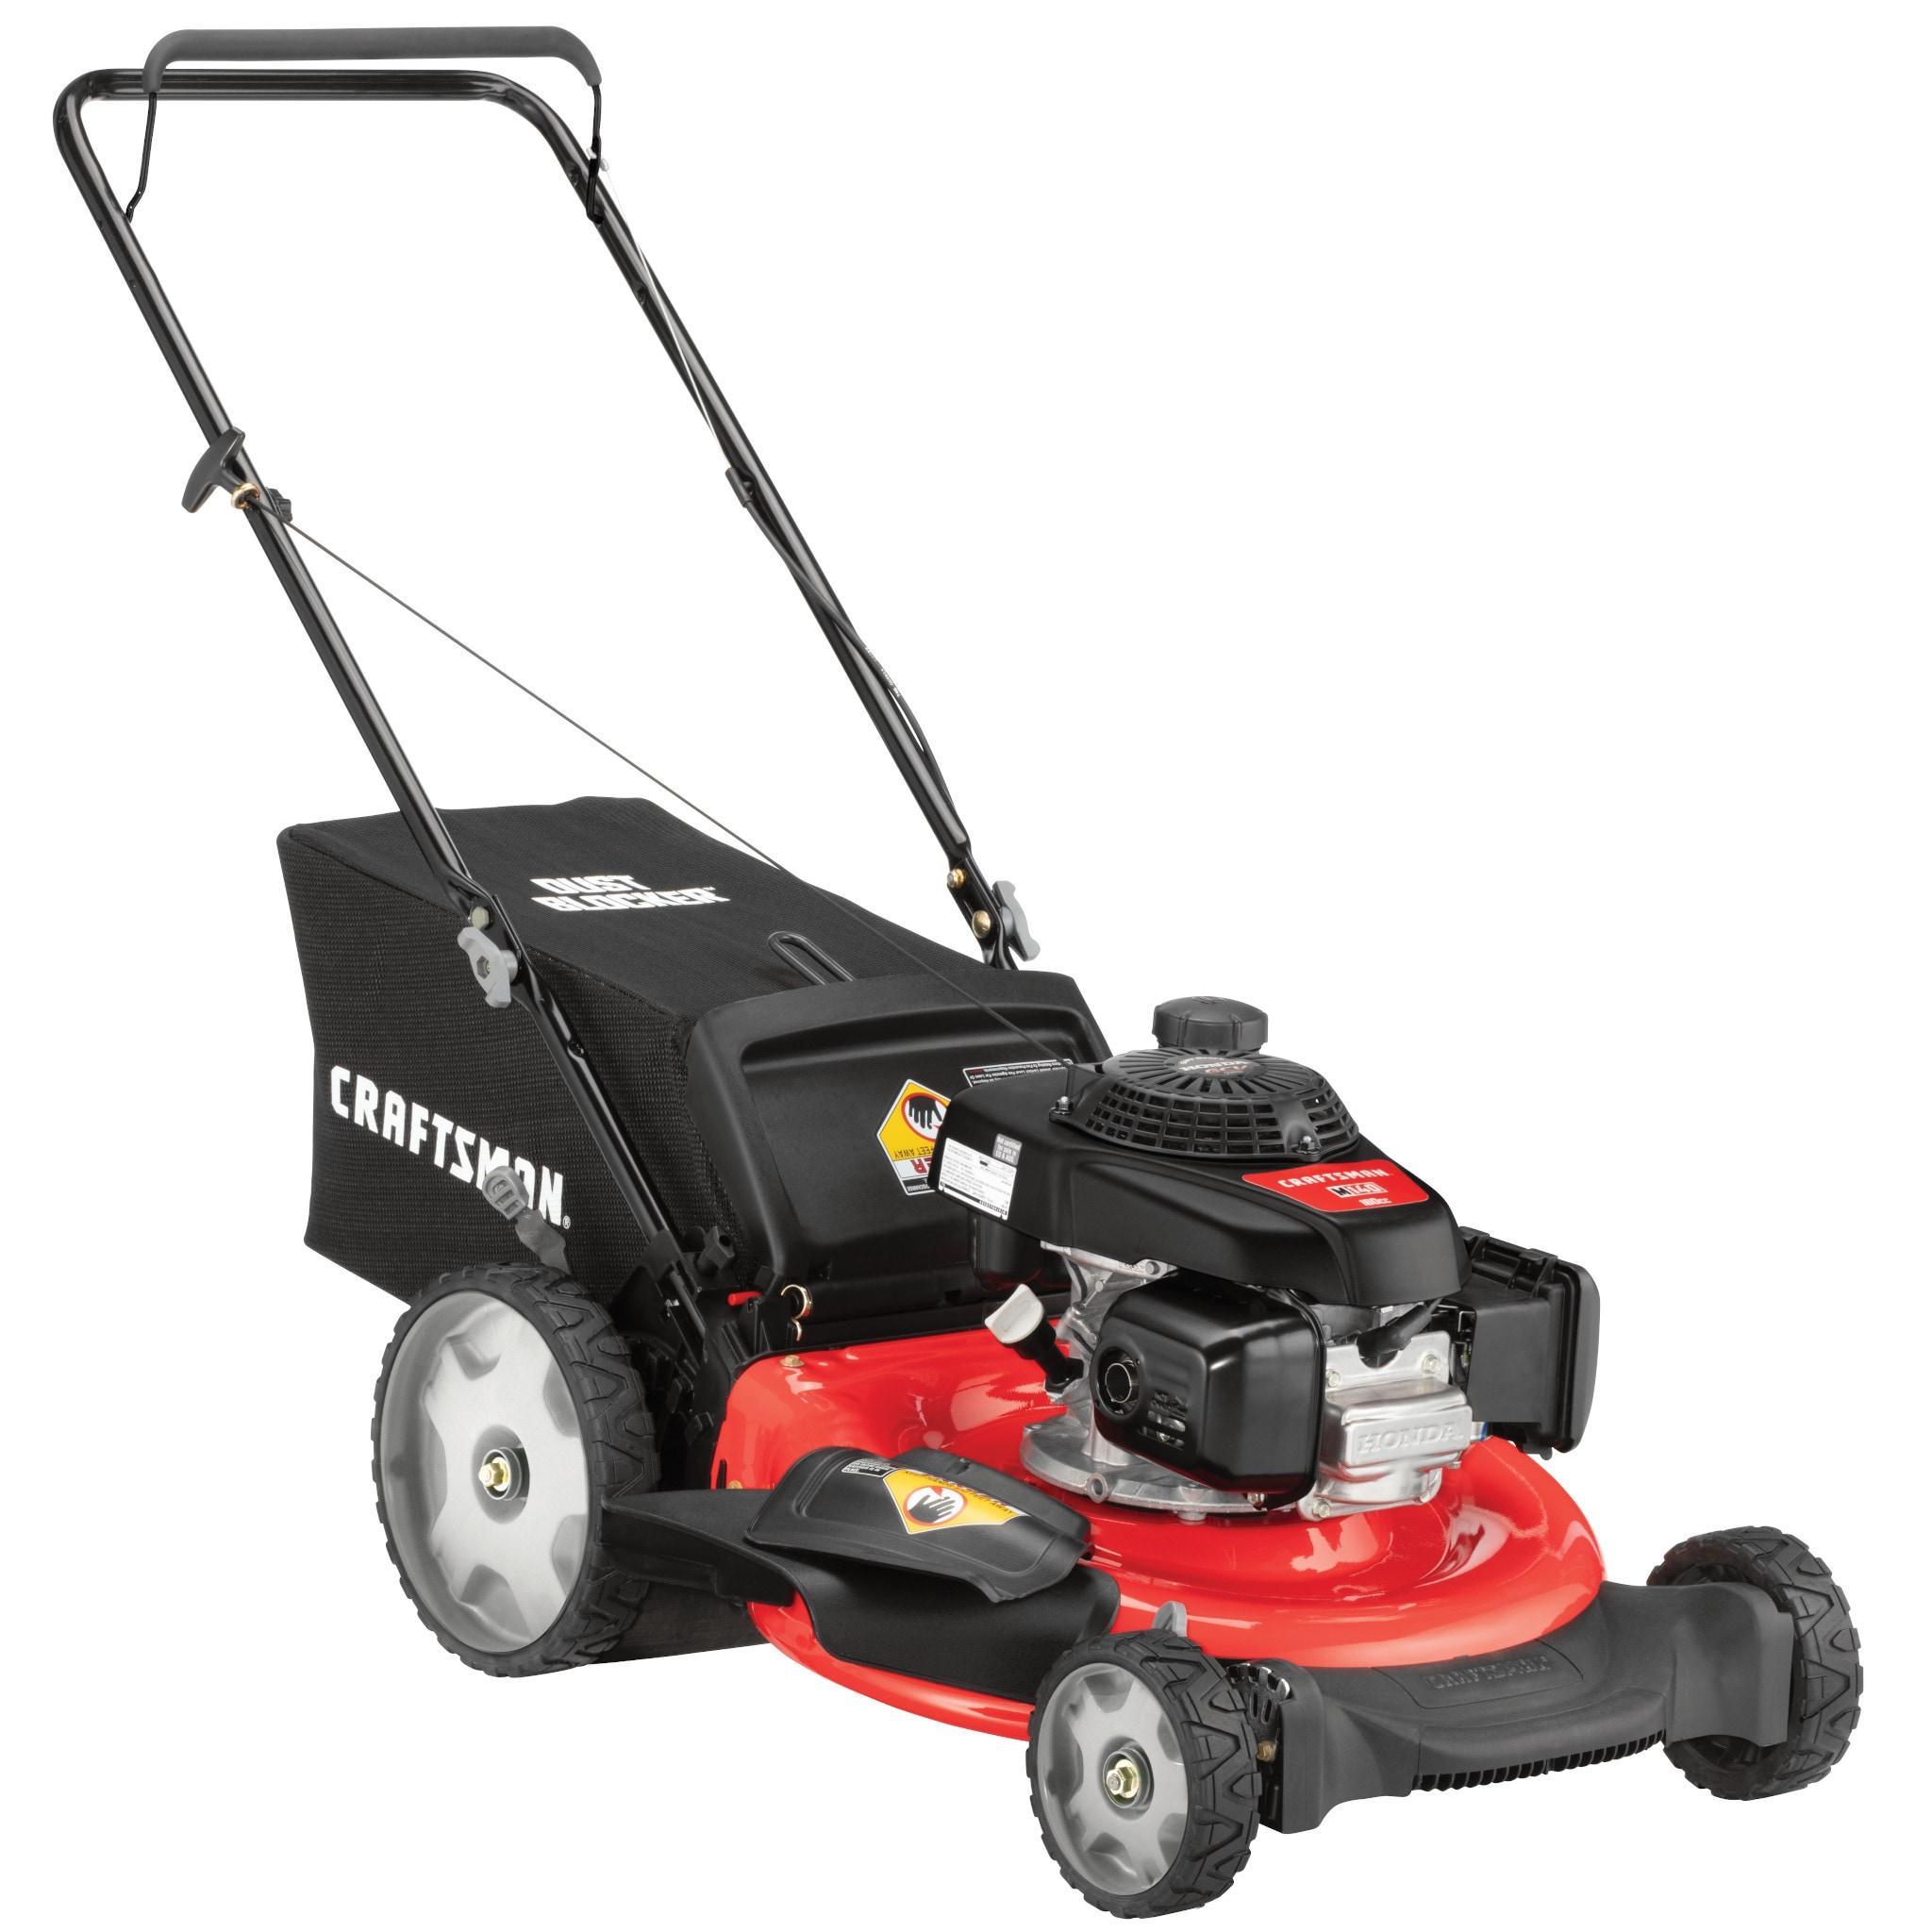 CRAFTSMAN M140 160-cc 21-in Gas Push Lawn Mower with Honda Engine | CMXGMAM1125500